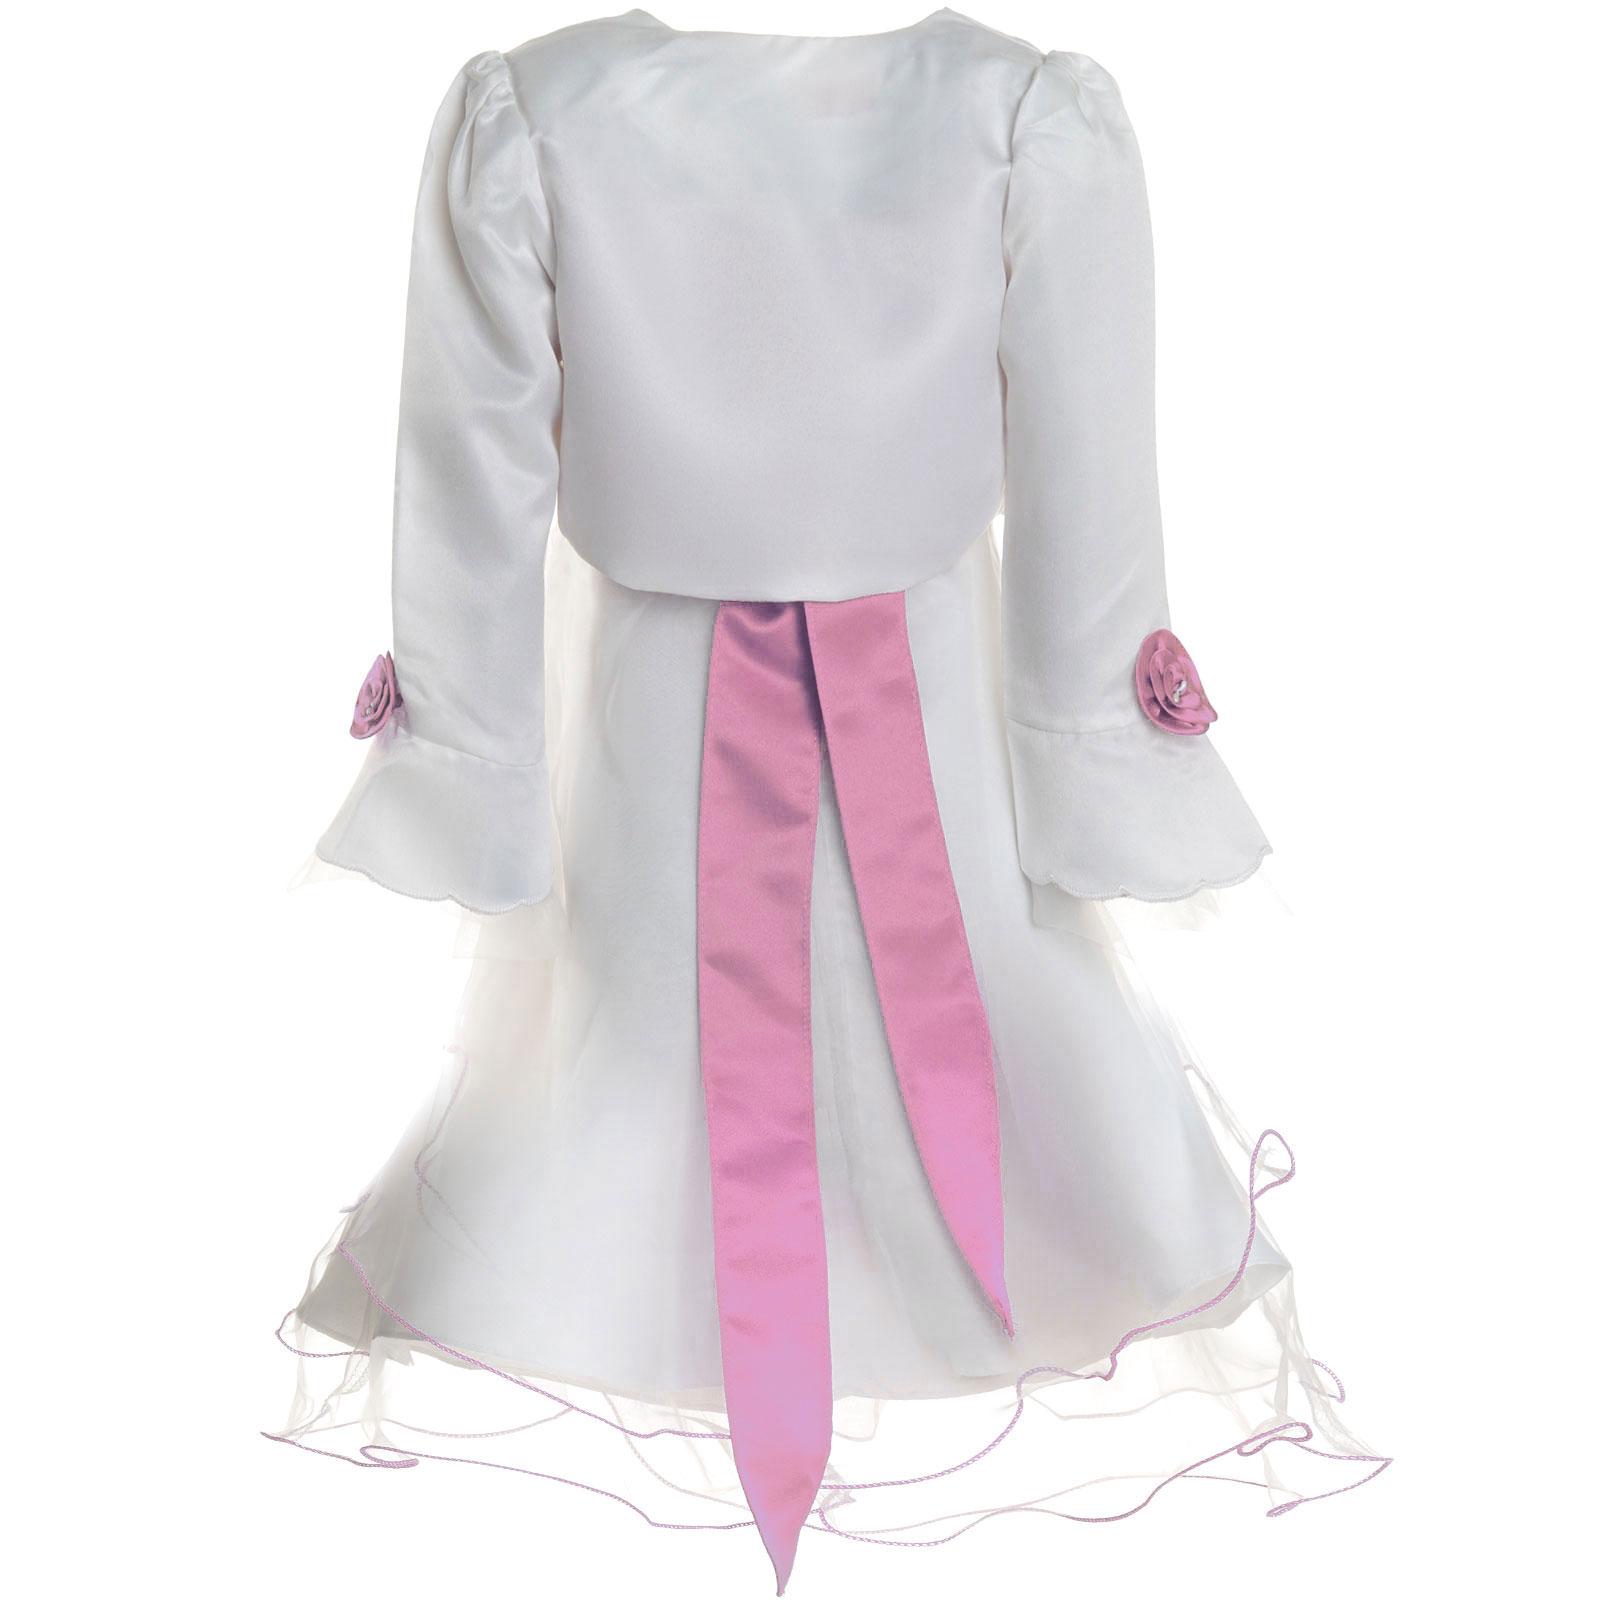 Maedchen-Kinder-Kleid-Peticoat-Festkleid-Lang-Arm-Kostuem-mit-Bolero-Rose-21476 Indexbild 15